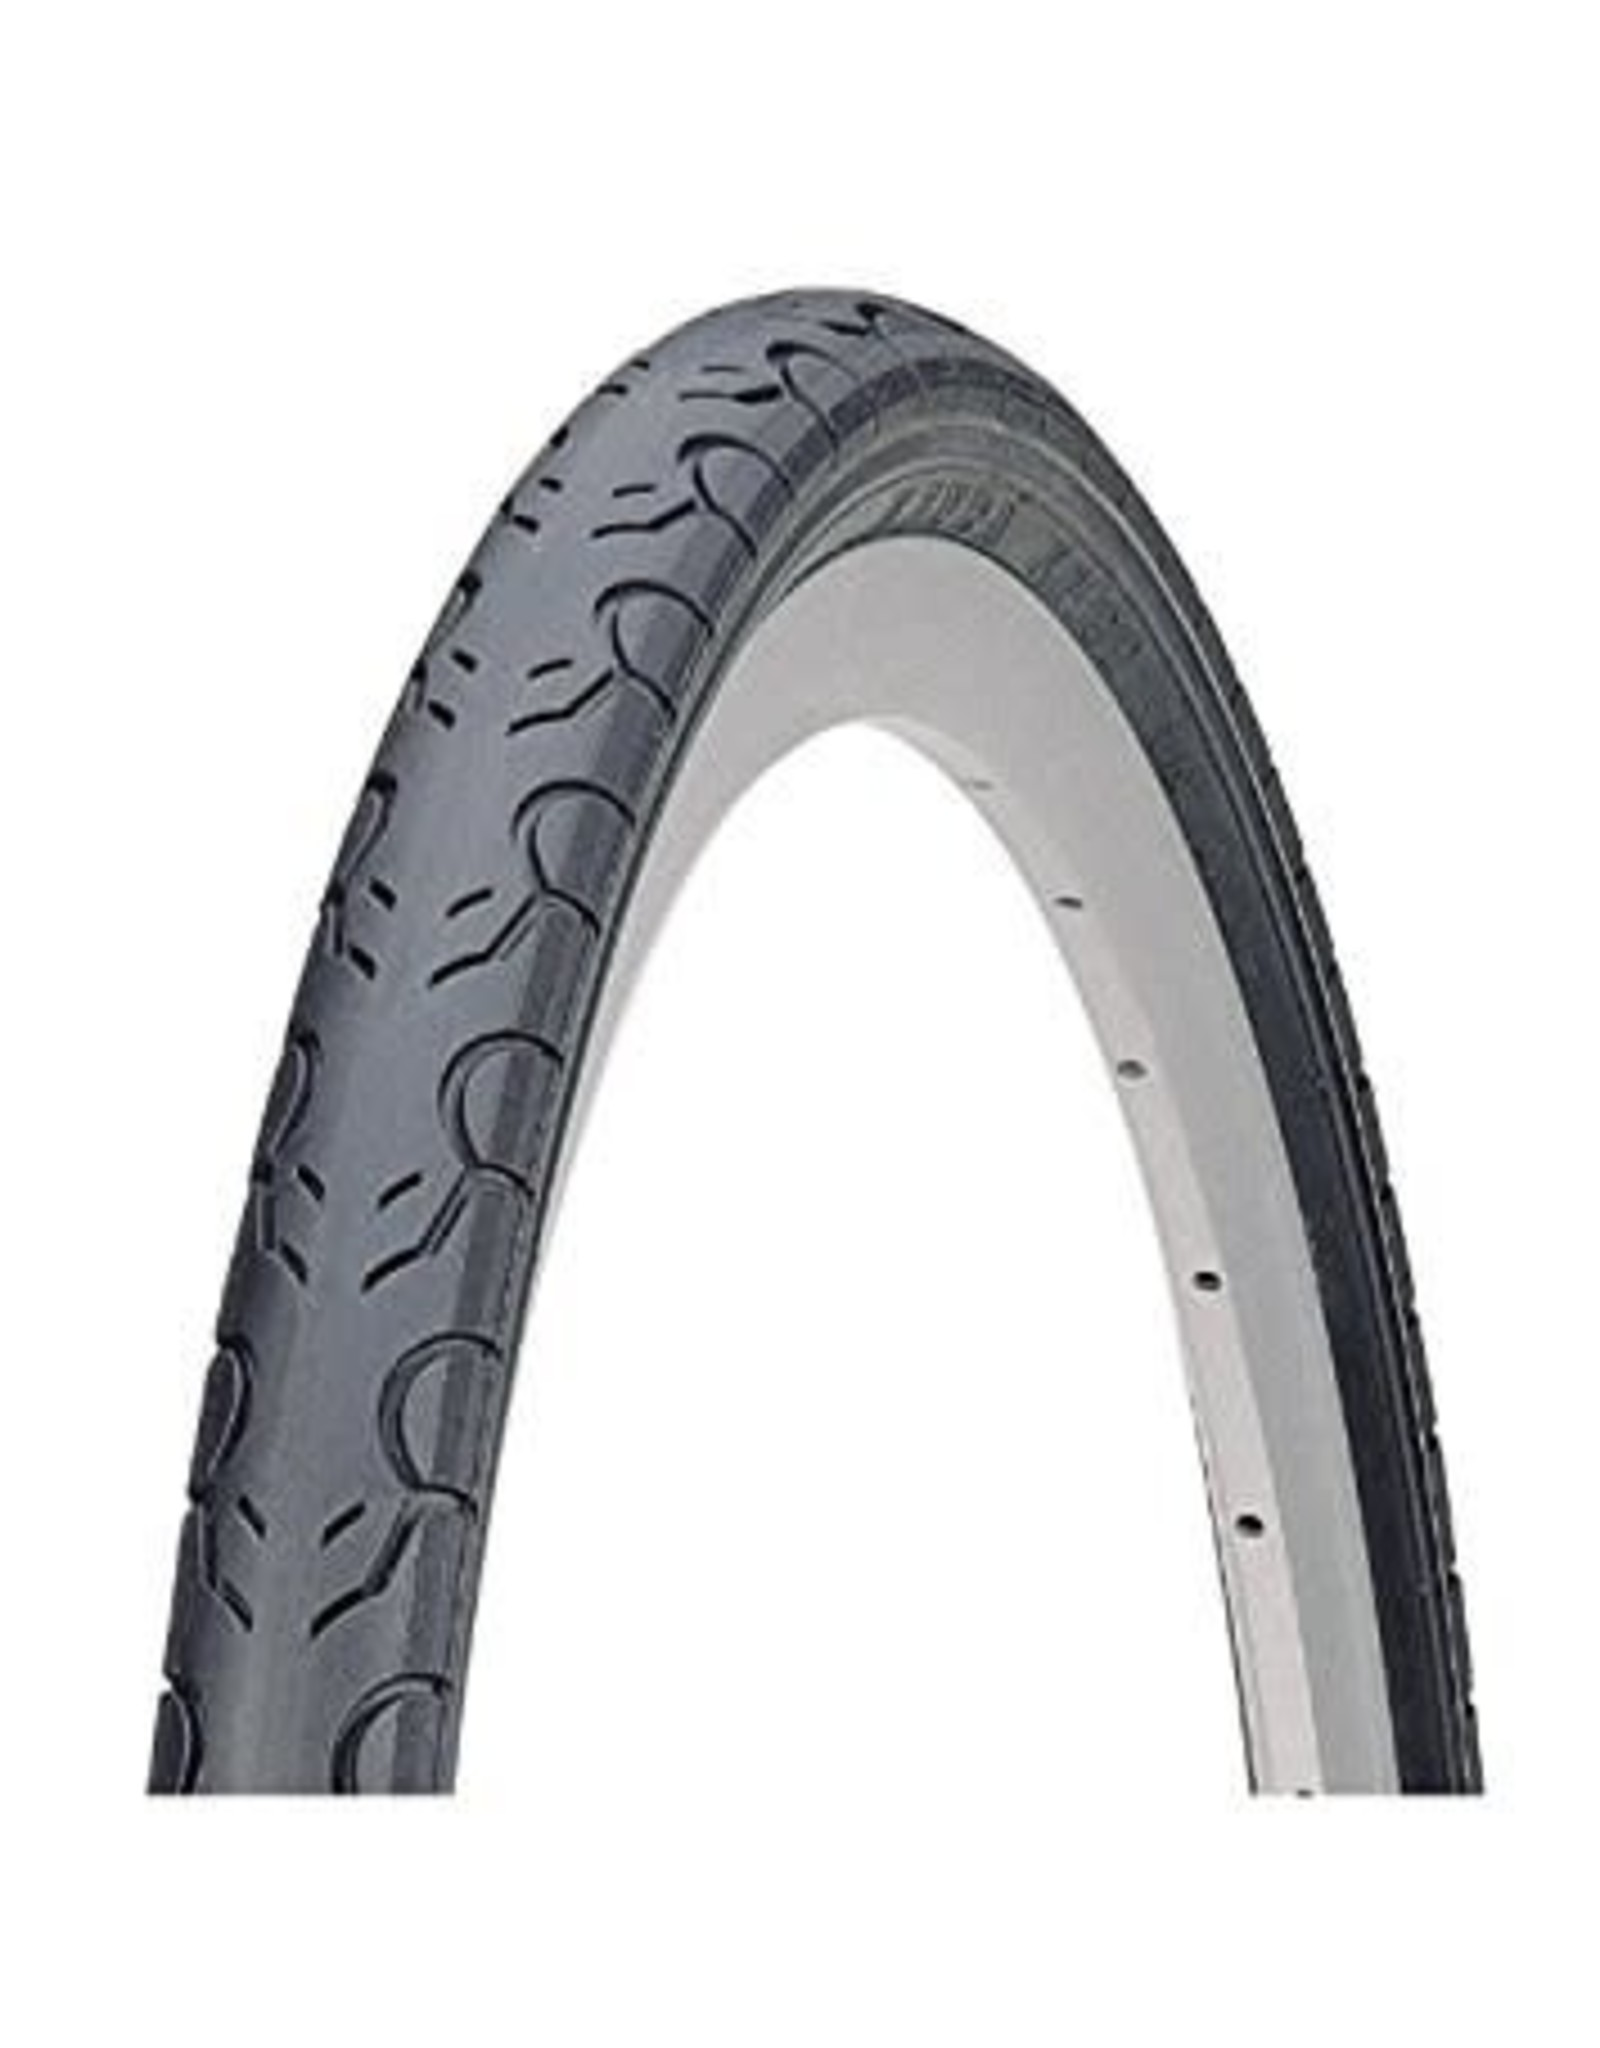 Kenda Kwest Tire 700x35